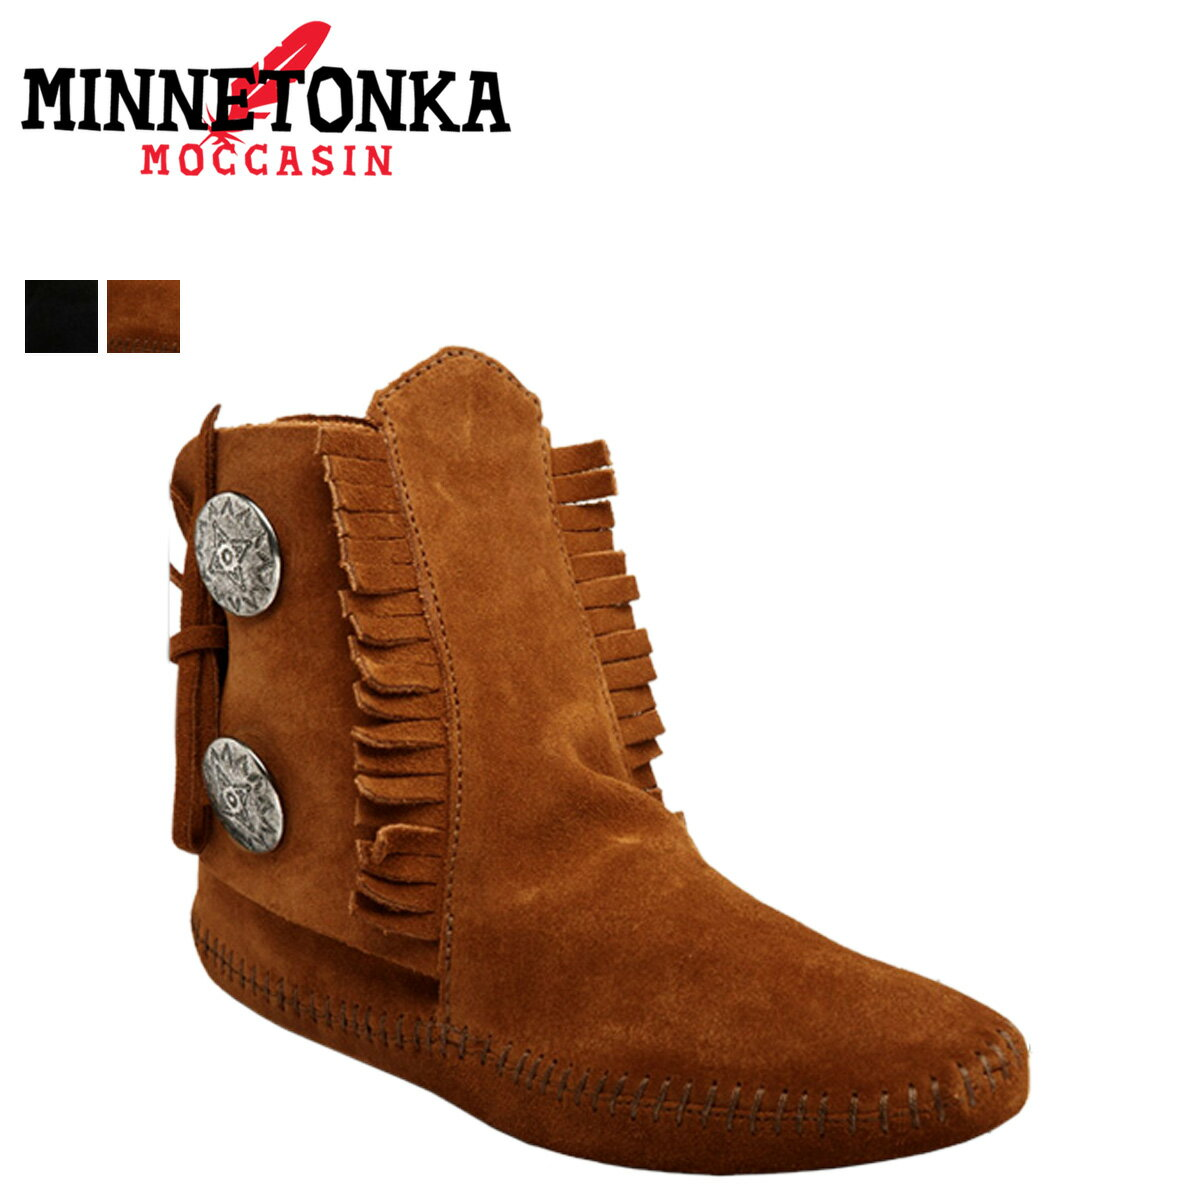 MINNETONKA TWO BUTTON BOOT SOFT SOLE ミネトンカ 2ボタン ブーツ ソフトソール レディース